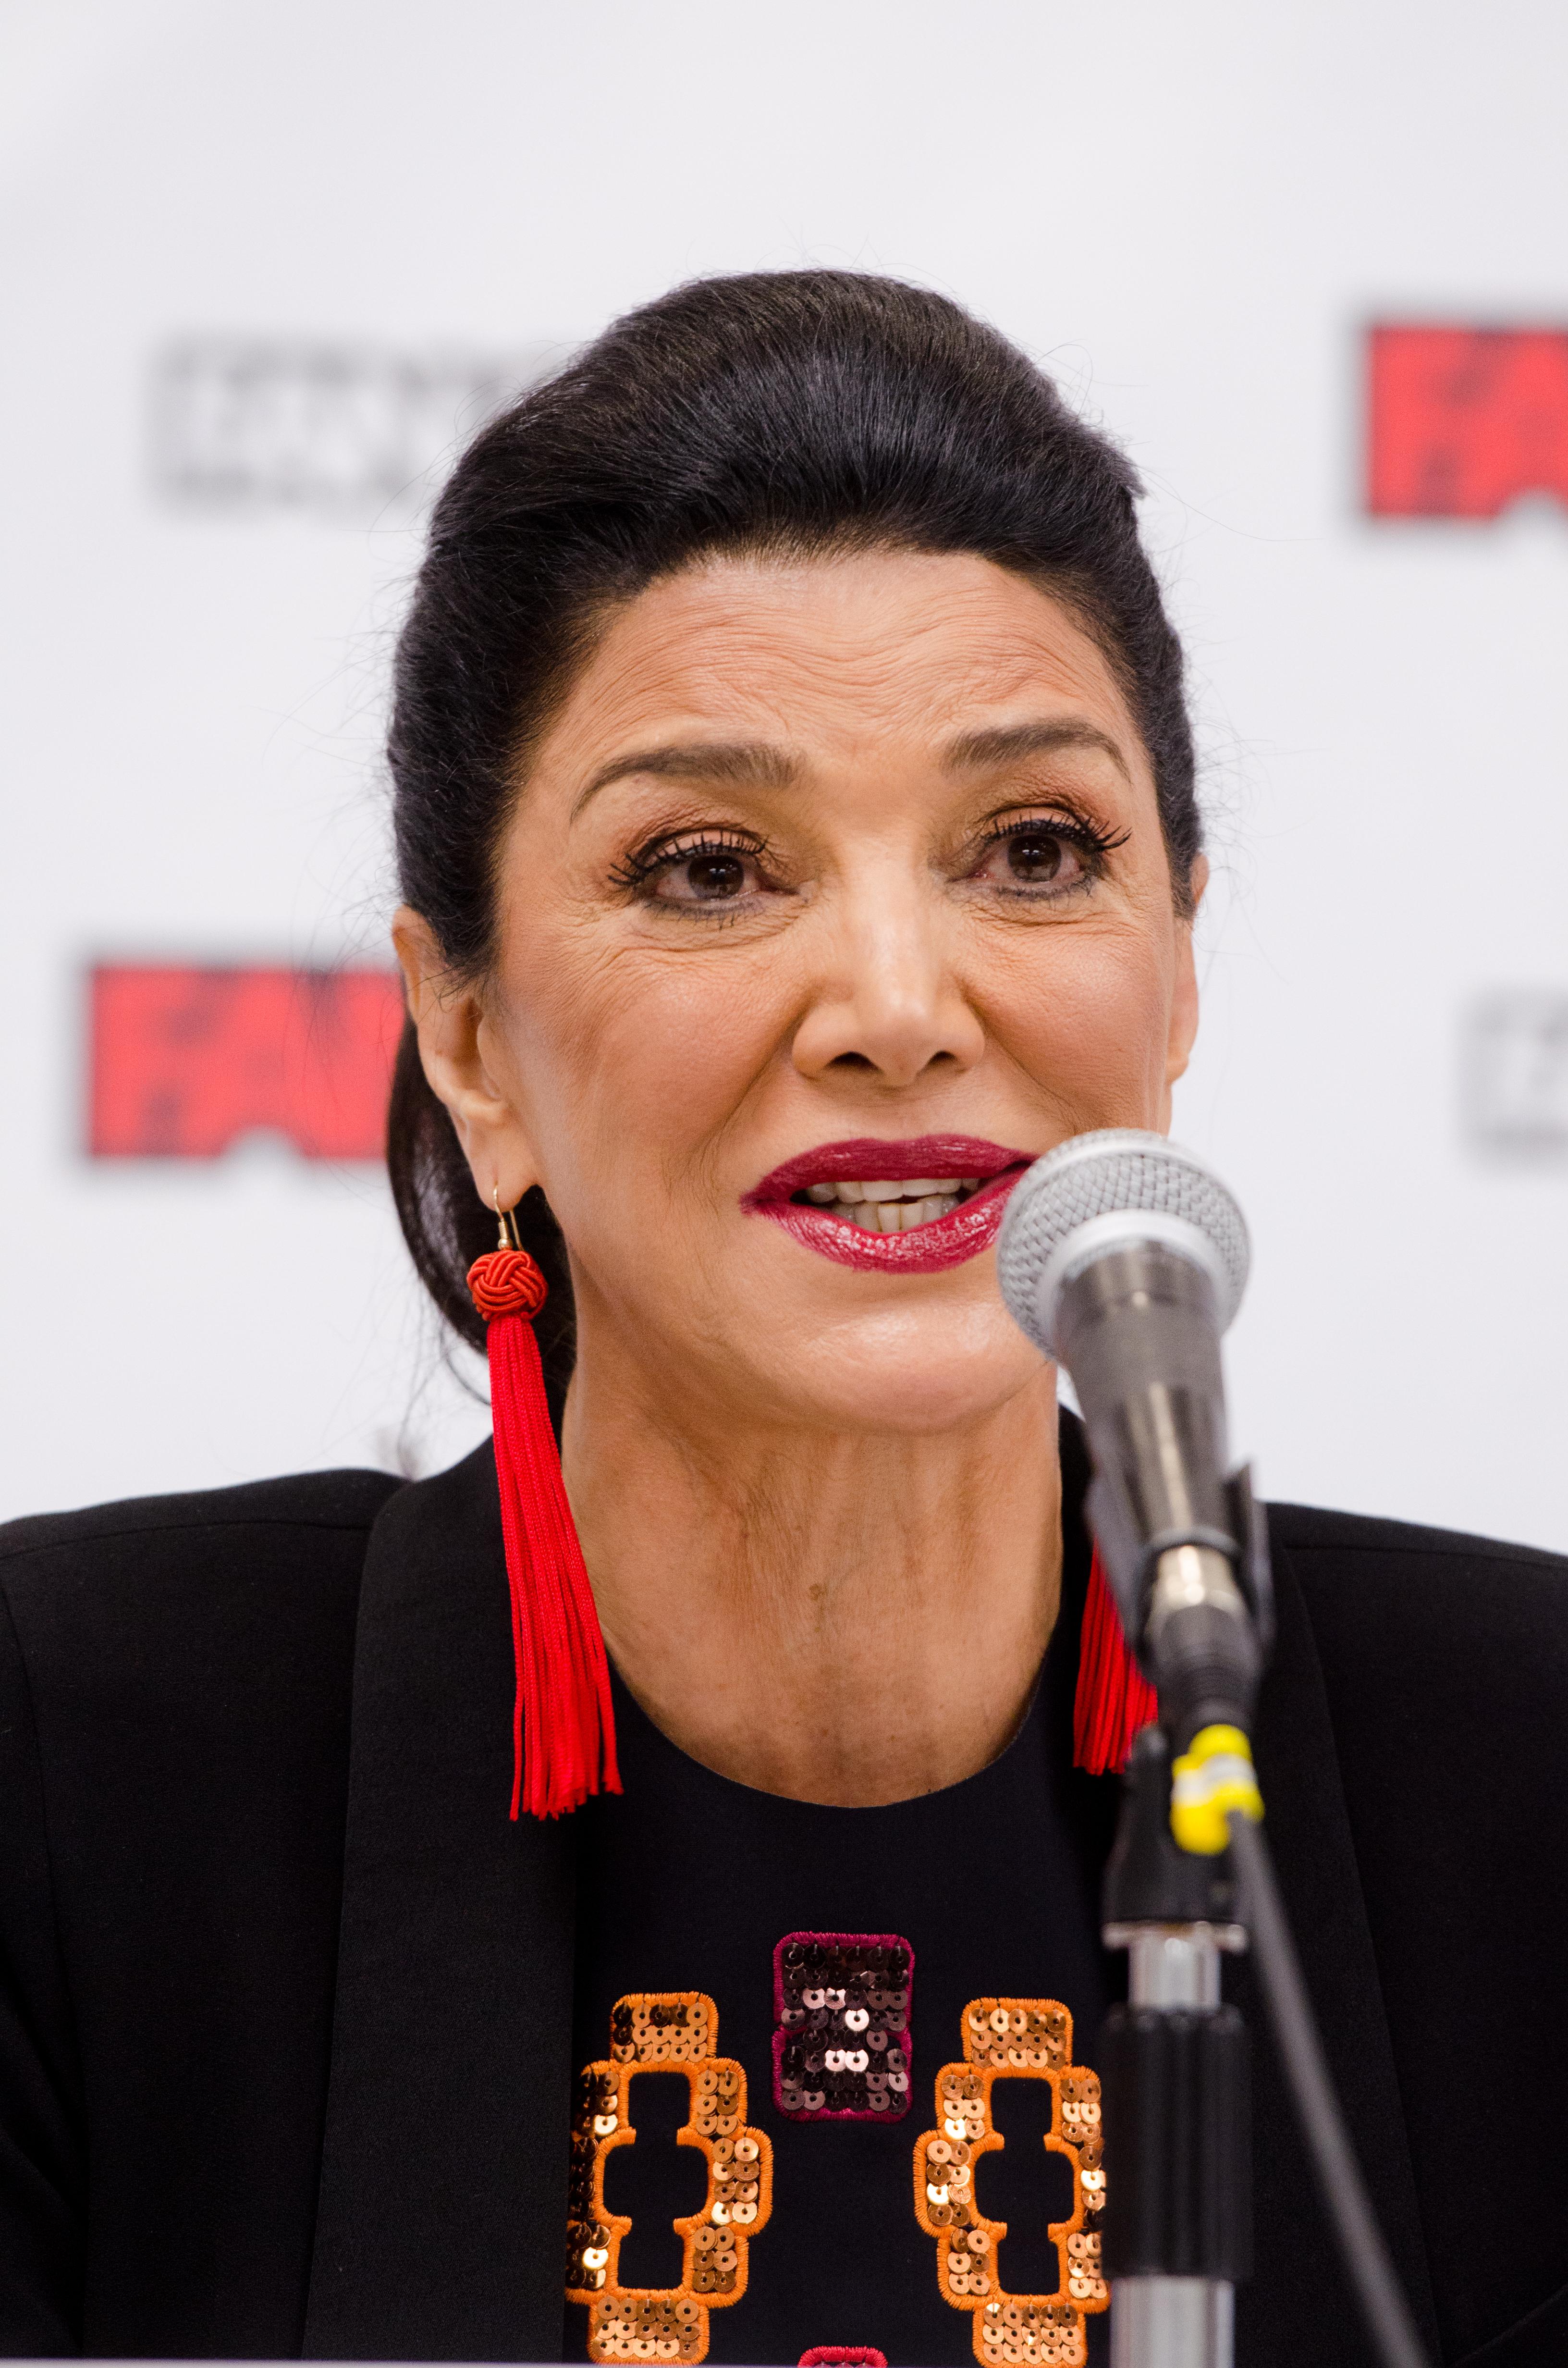 Teressa Liane,Faria Alam Adult video Sheena Easton (born 1959 (naturalized American citizen),Christine Pak